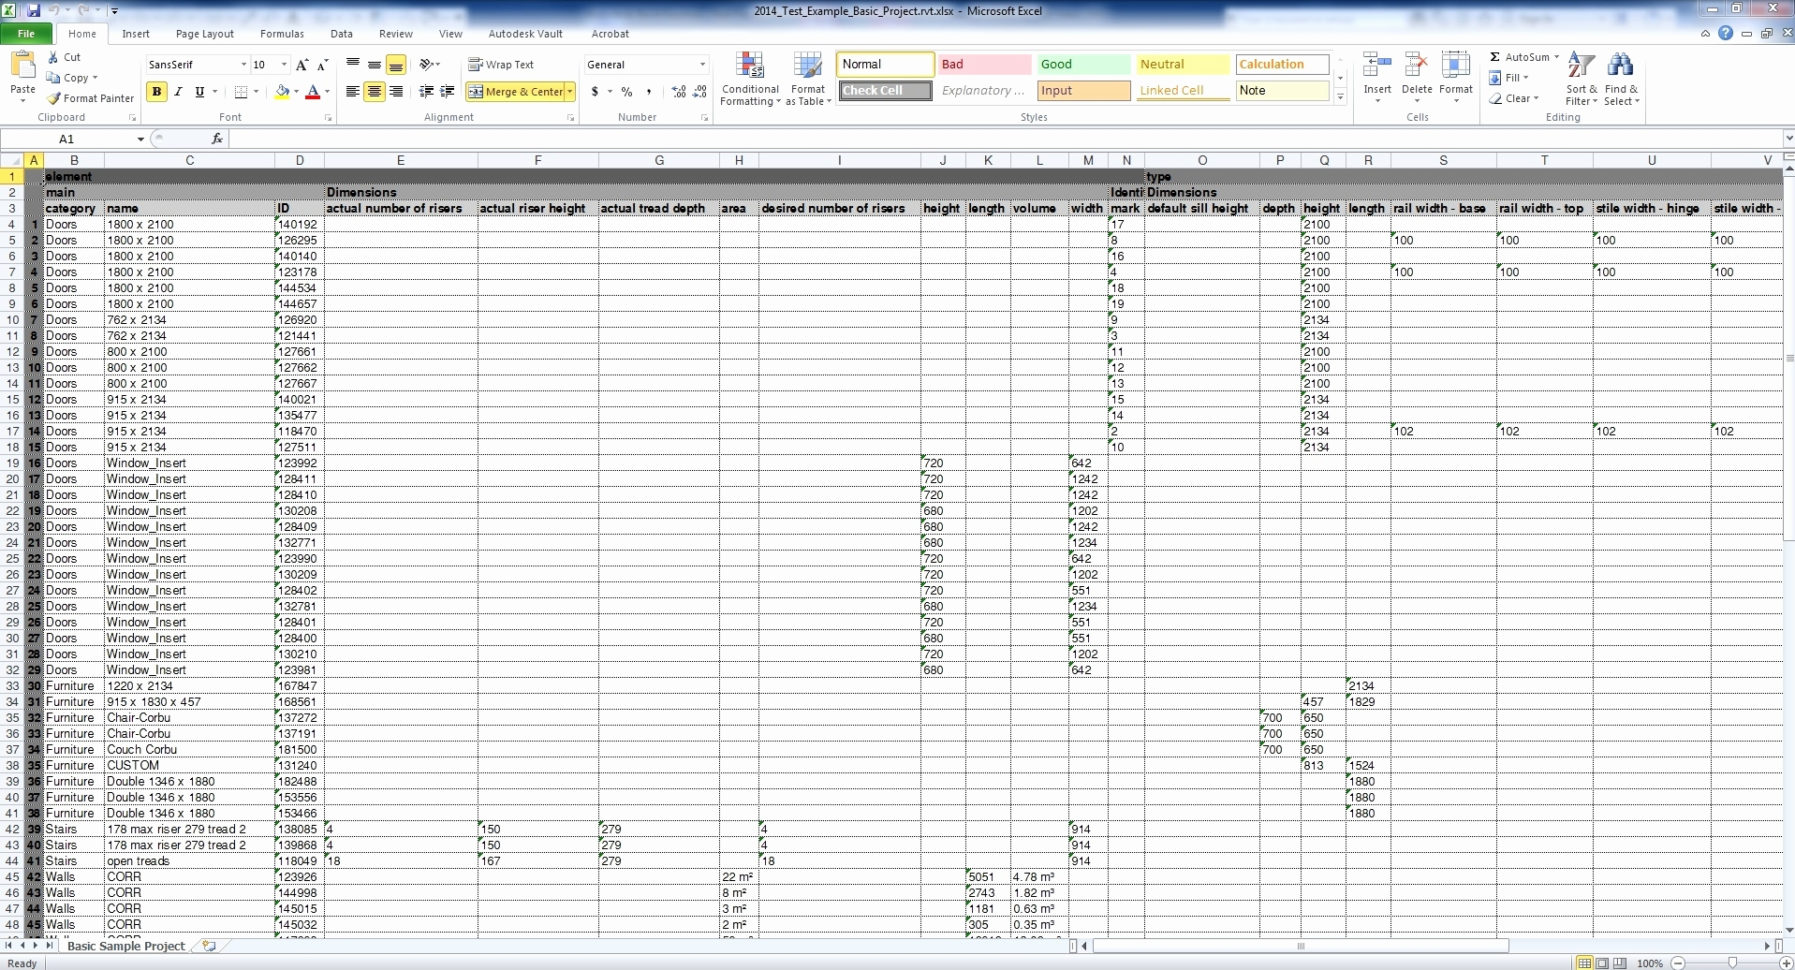 auto restoration spreadsheet  Auto Restoration Spreadsheet Inside Car Restoration Cost Spreadsheet Sheet Construction Estimating Auto Restoration Spreadsheet Printable Spreadshee